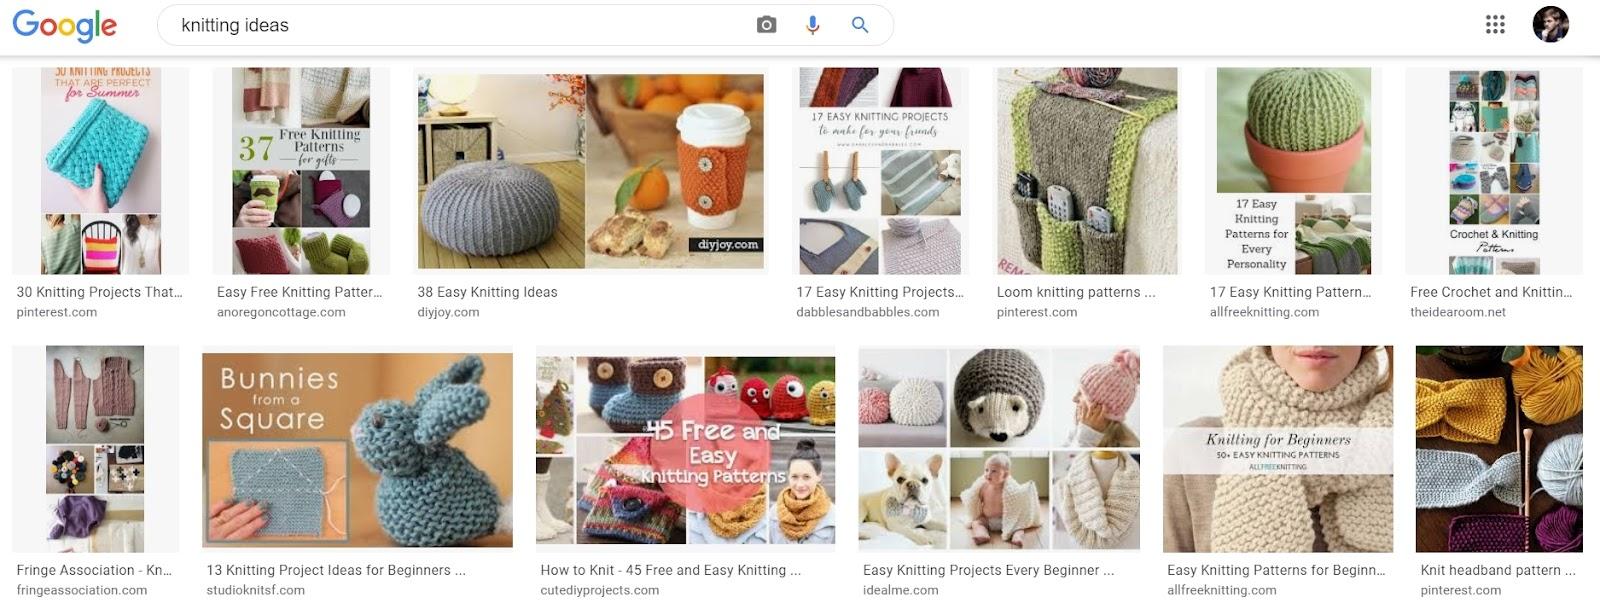 google images SERP